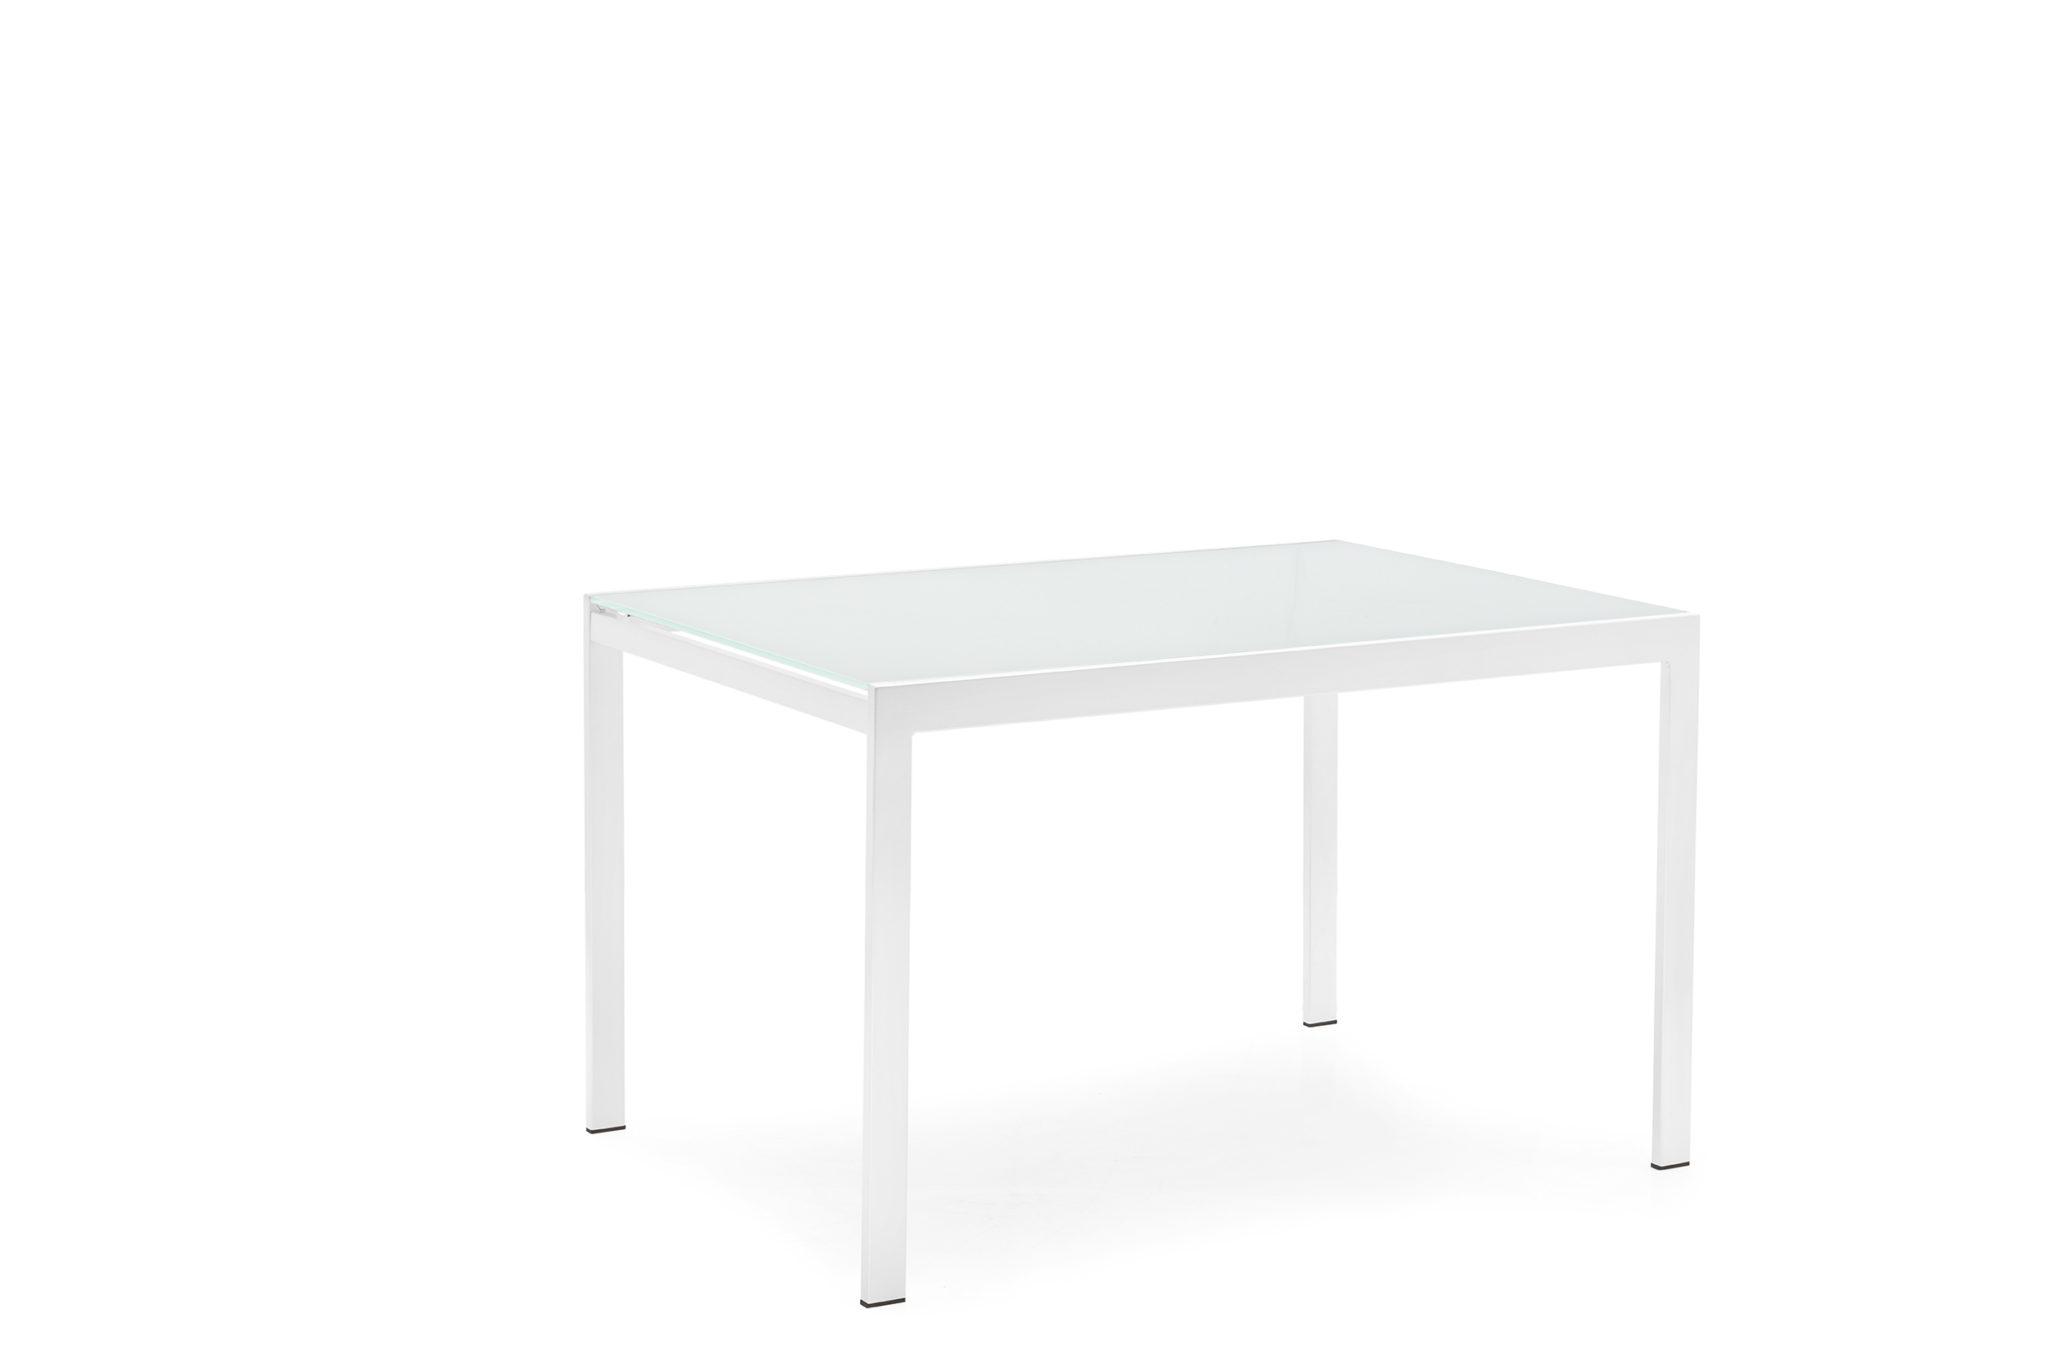 Tavolo Aladino 110 vetro Connubia by Calligaris - linea tavoli e sedie